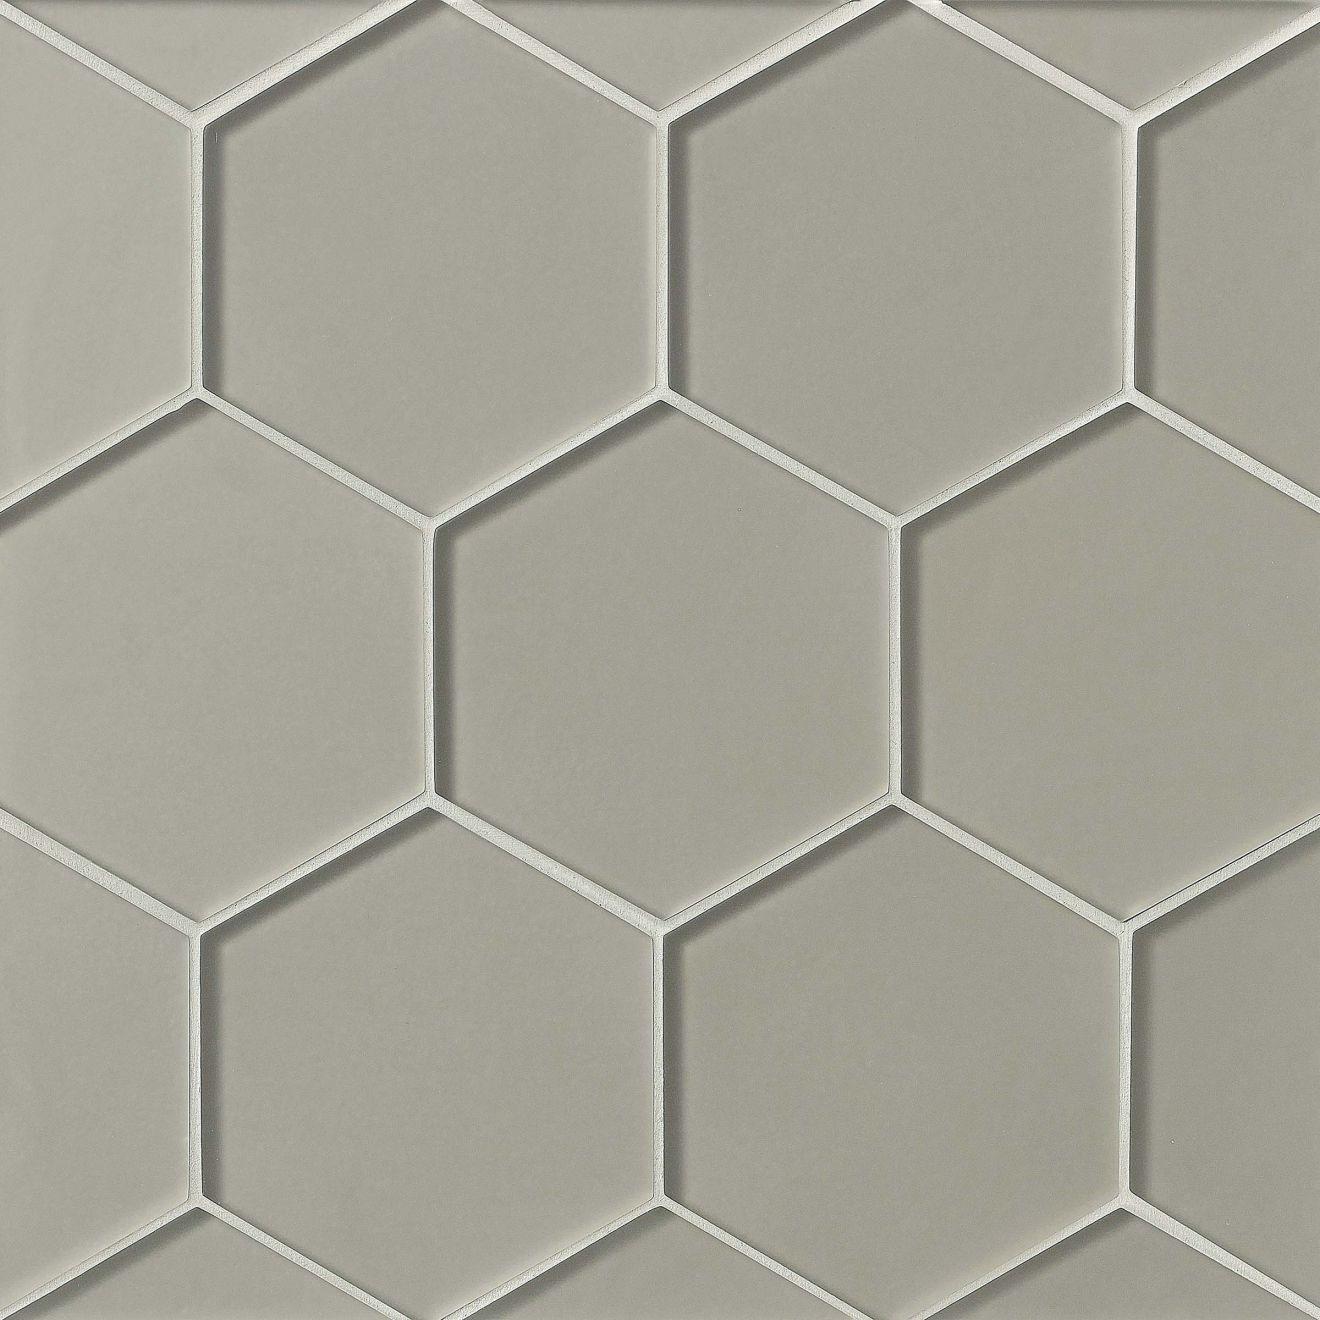 "Verve 4-7/8"" x 5-5/8"" Wall Mosaic in Tinsel Grey"